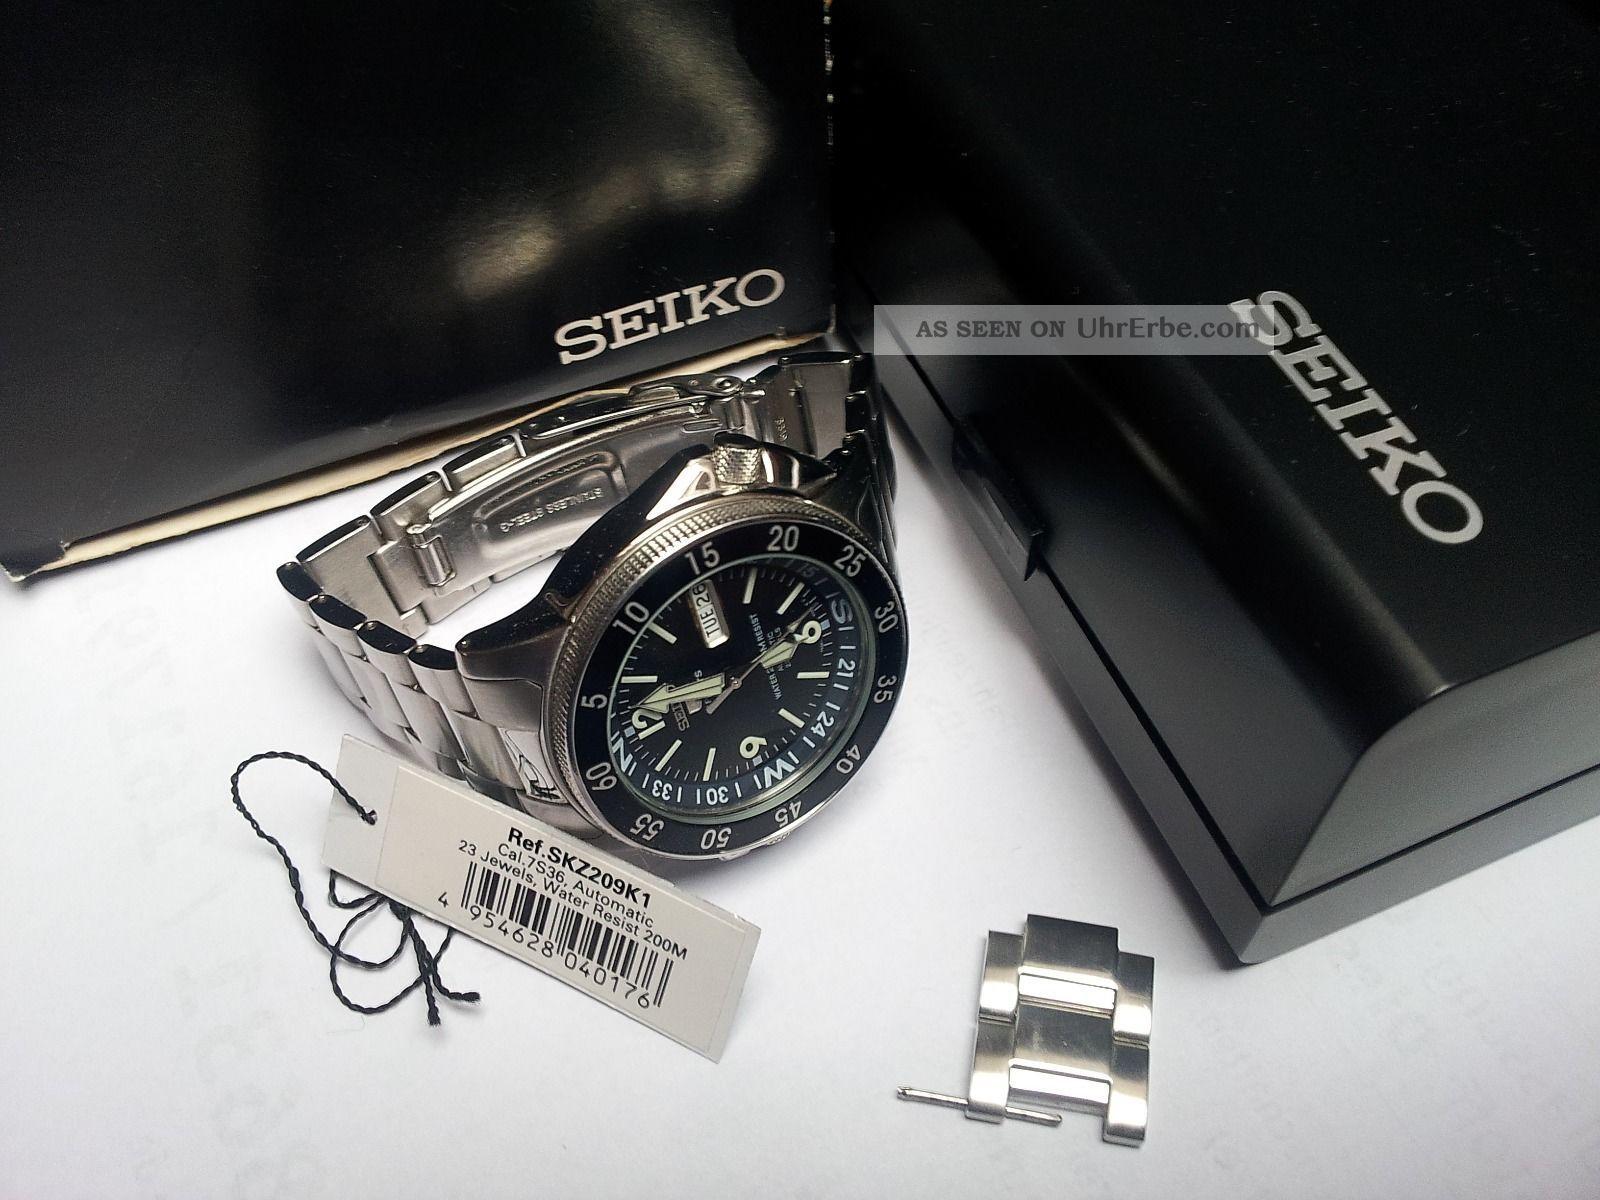 Uhr Seiko 5 Sports Automatic Hau Skz209k1 Diver Kompass Outdoor Armbanduhren Bild